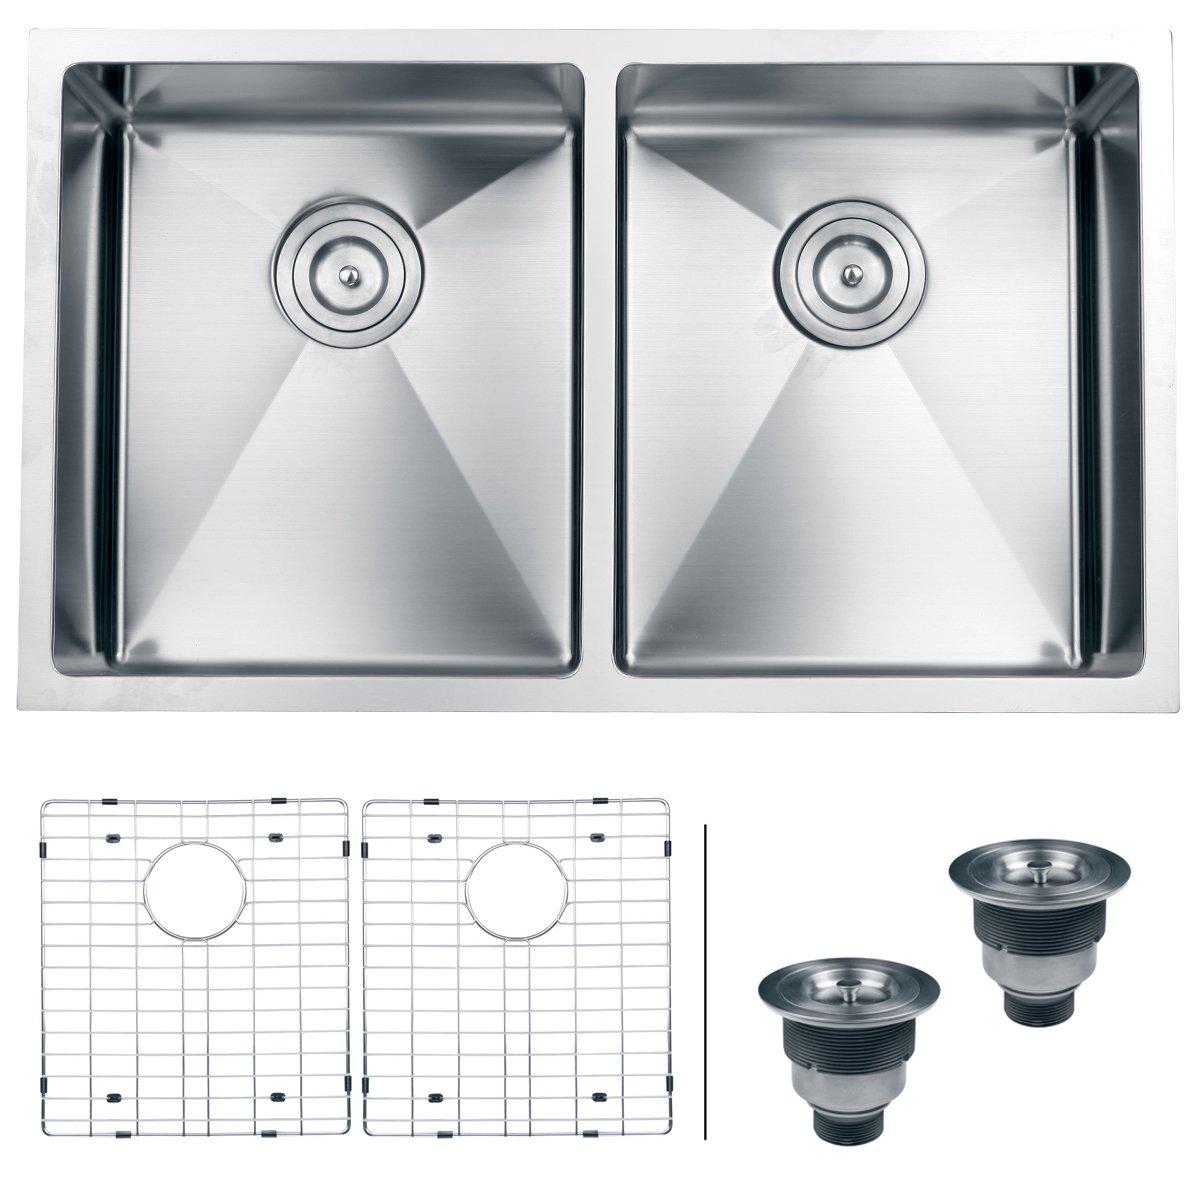 Ruvati 32-inch Undermount 50/50 Double Bowl Tight Radius 16 Gauge Stainless Steel Kitchen Sink - RVH7401